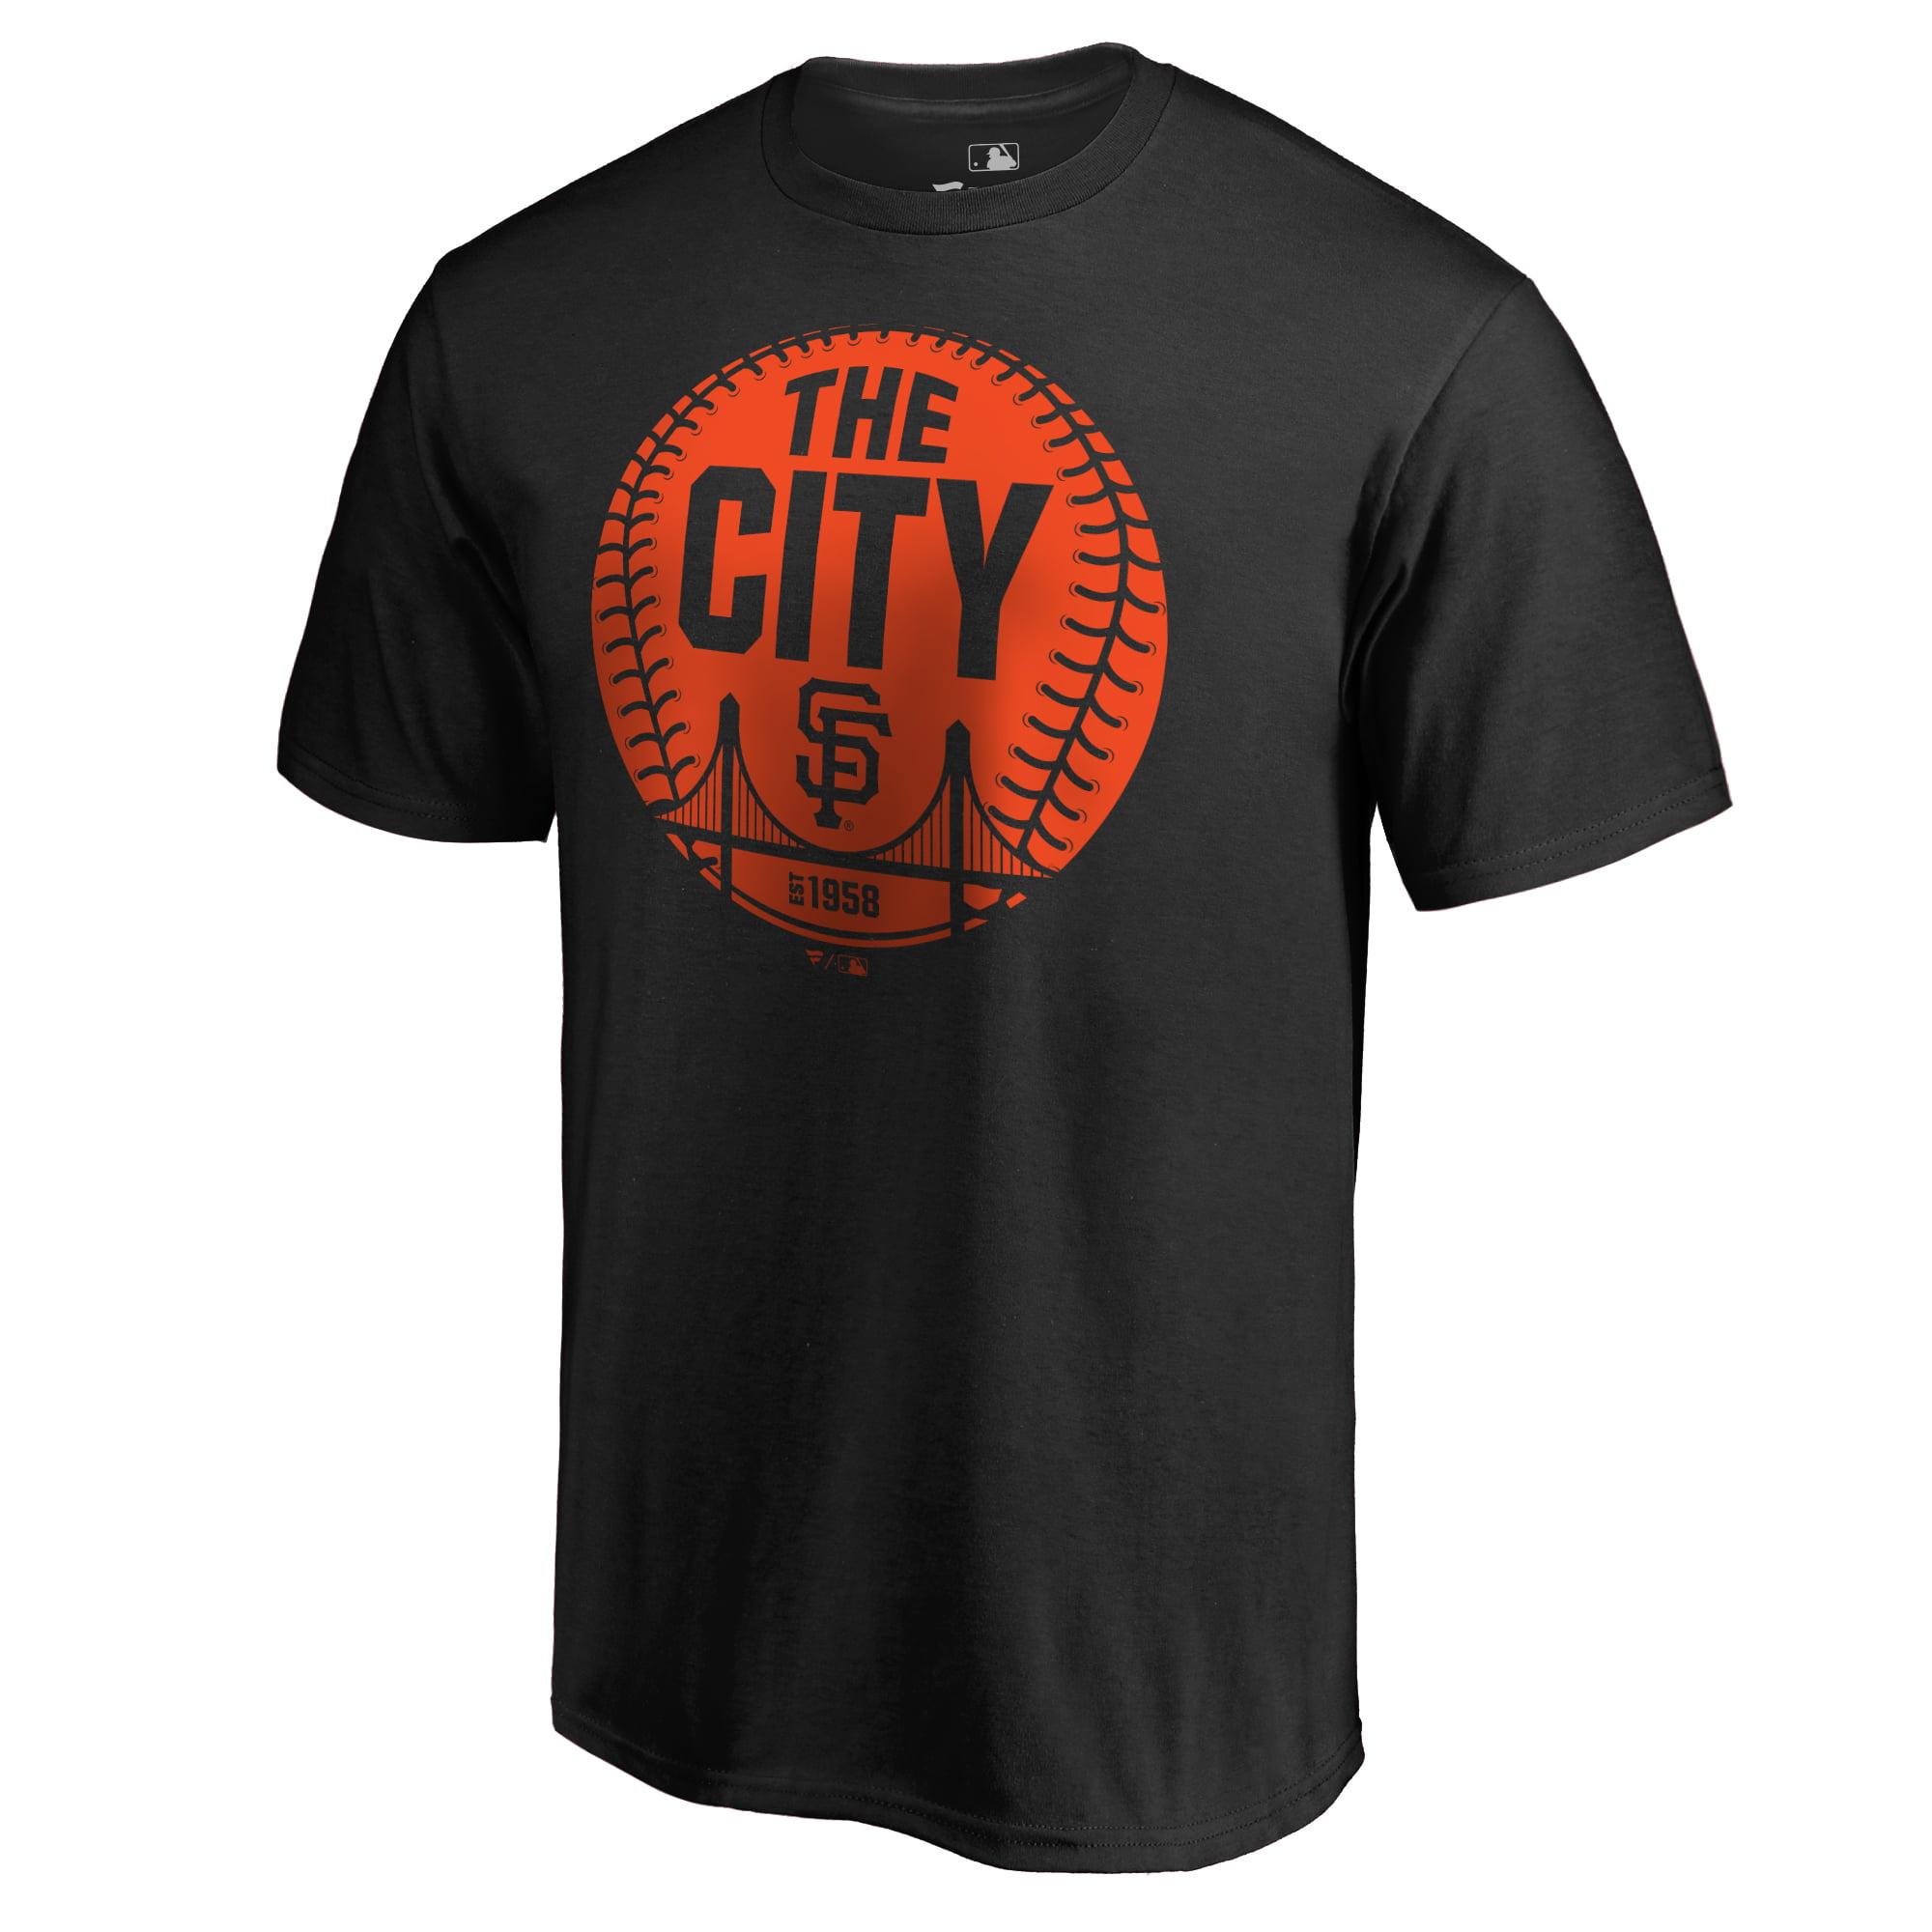 San Francisco Giants Cityball Hometown T-Shirt - Black